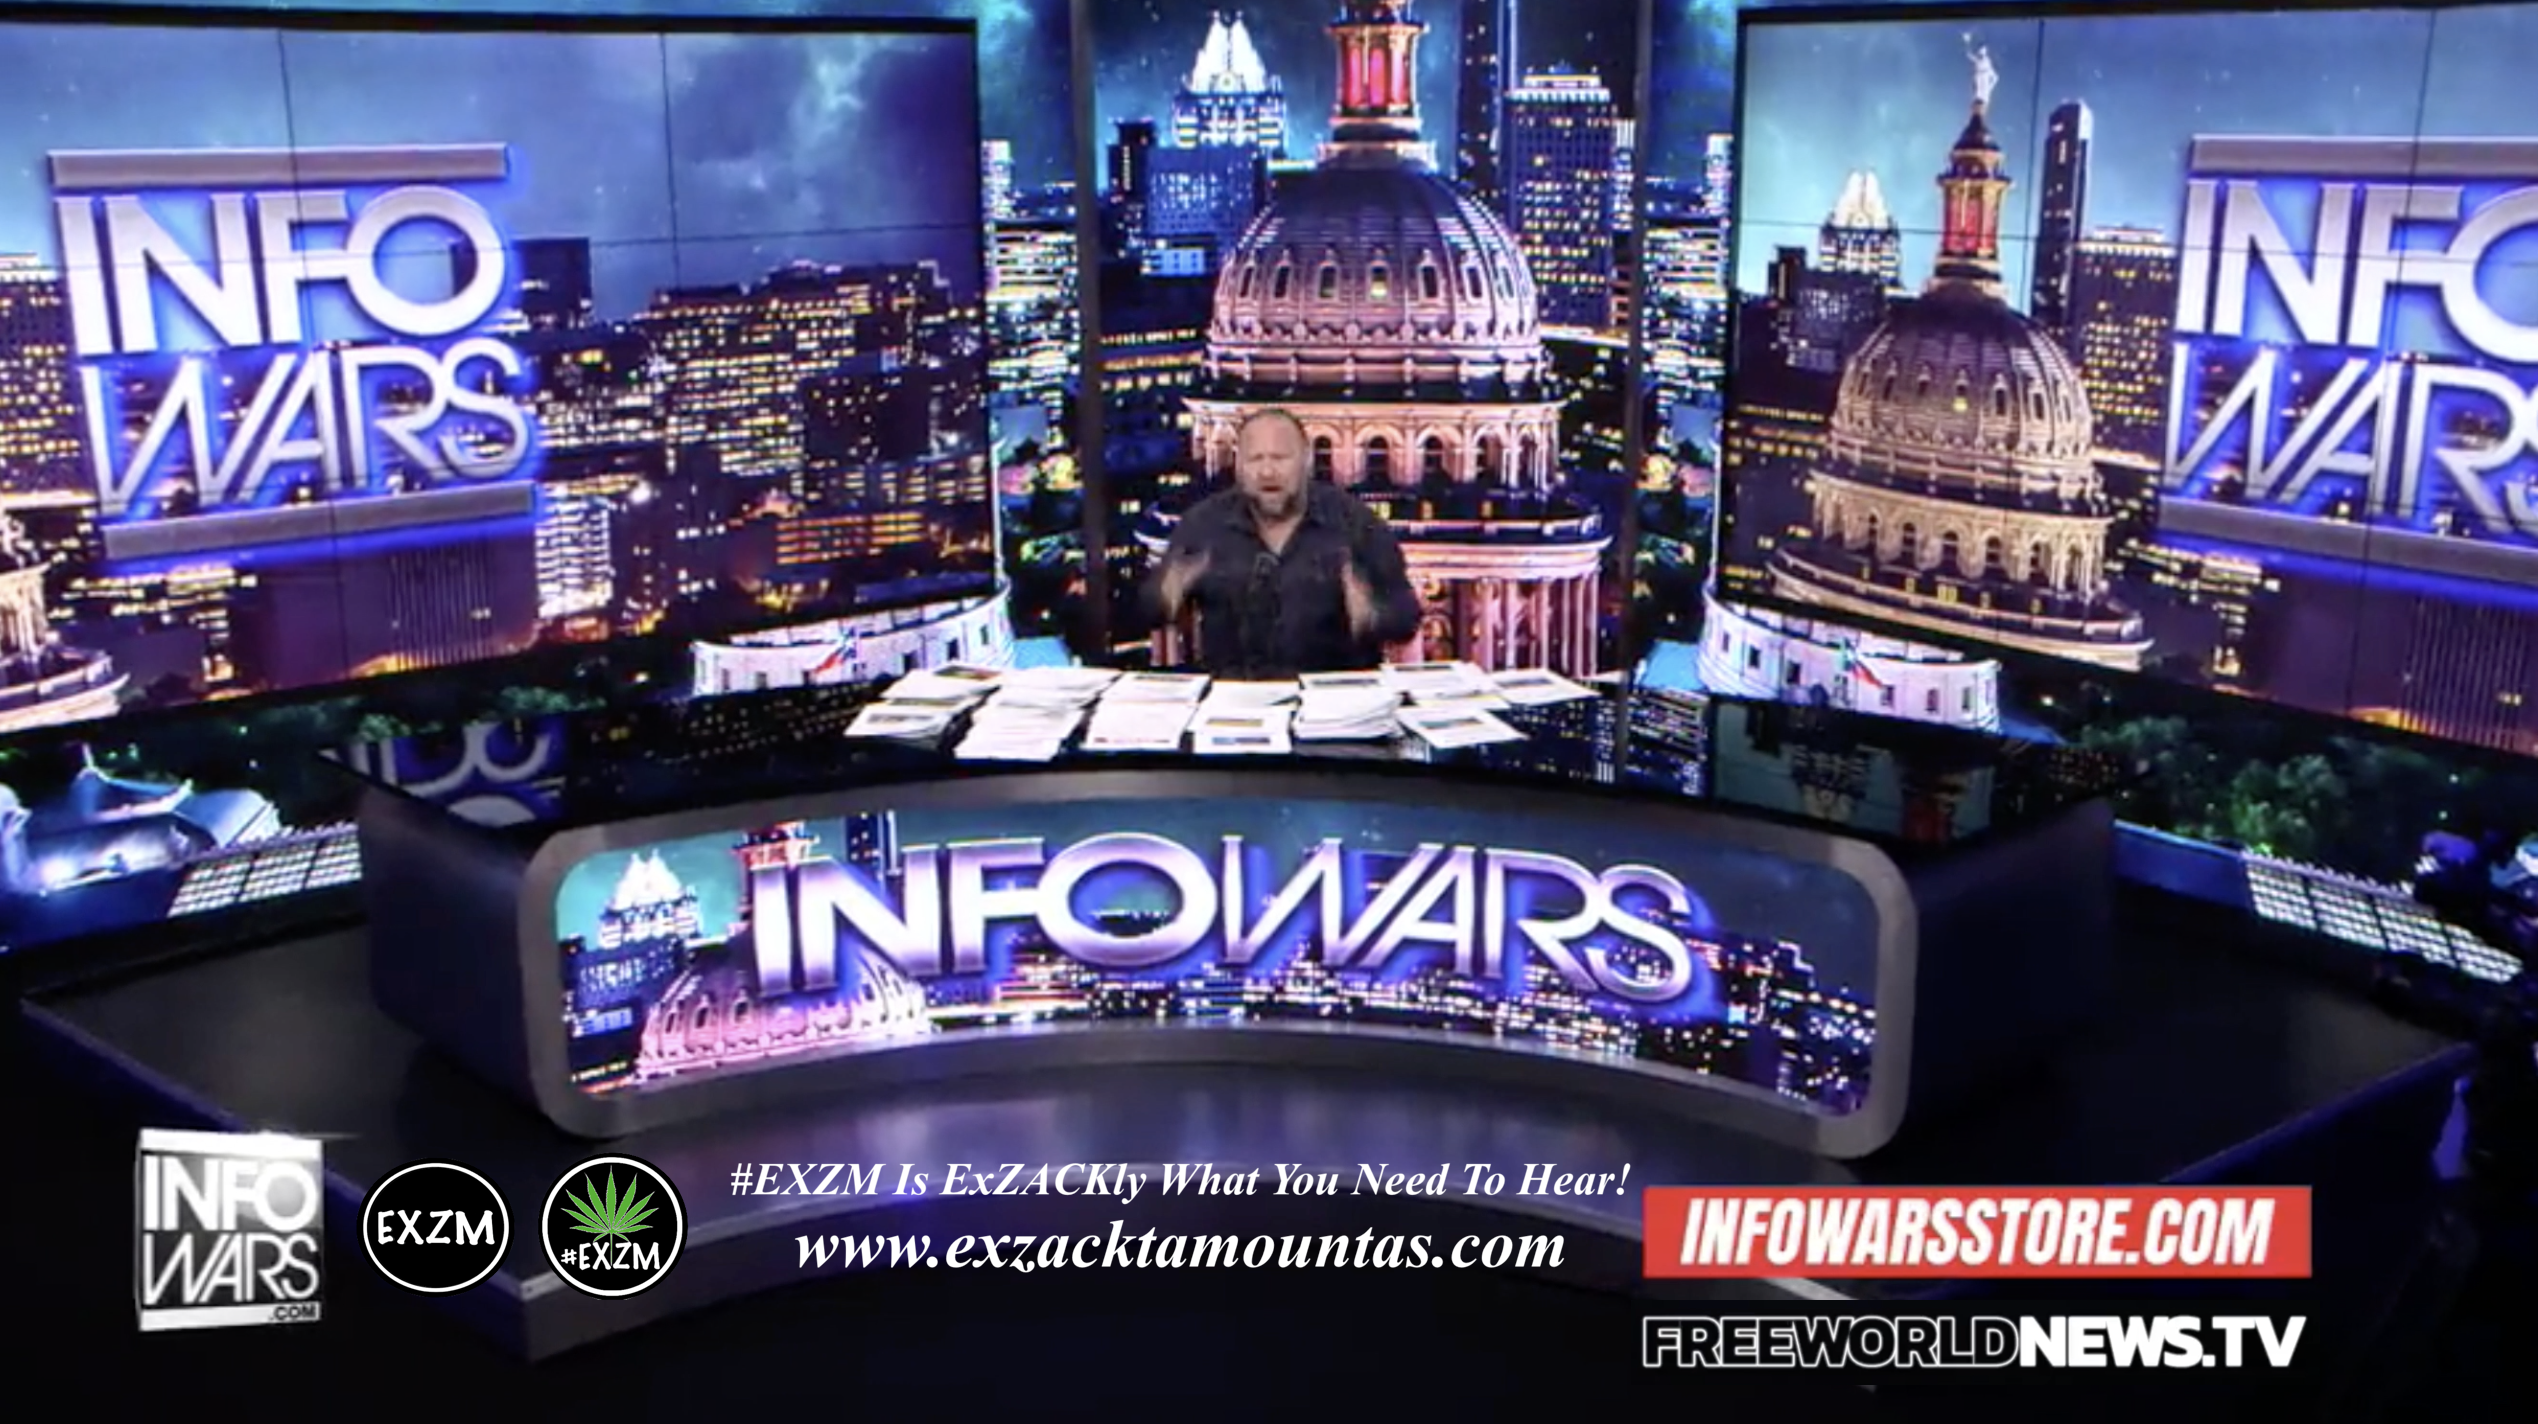 Alex Jones Live In Infowars Studio Free World News TV EXZM Zack Mount September 8th 2021 copy